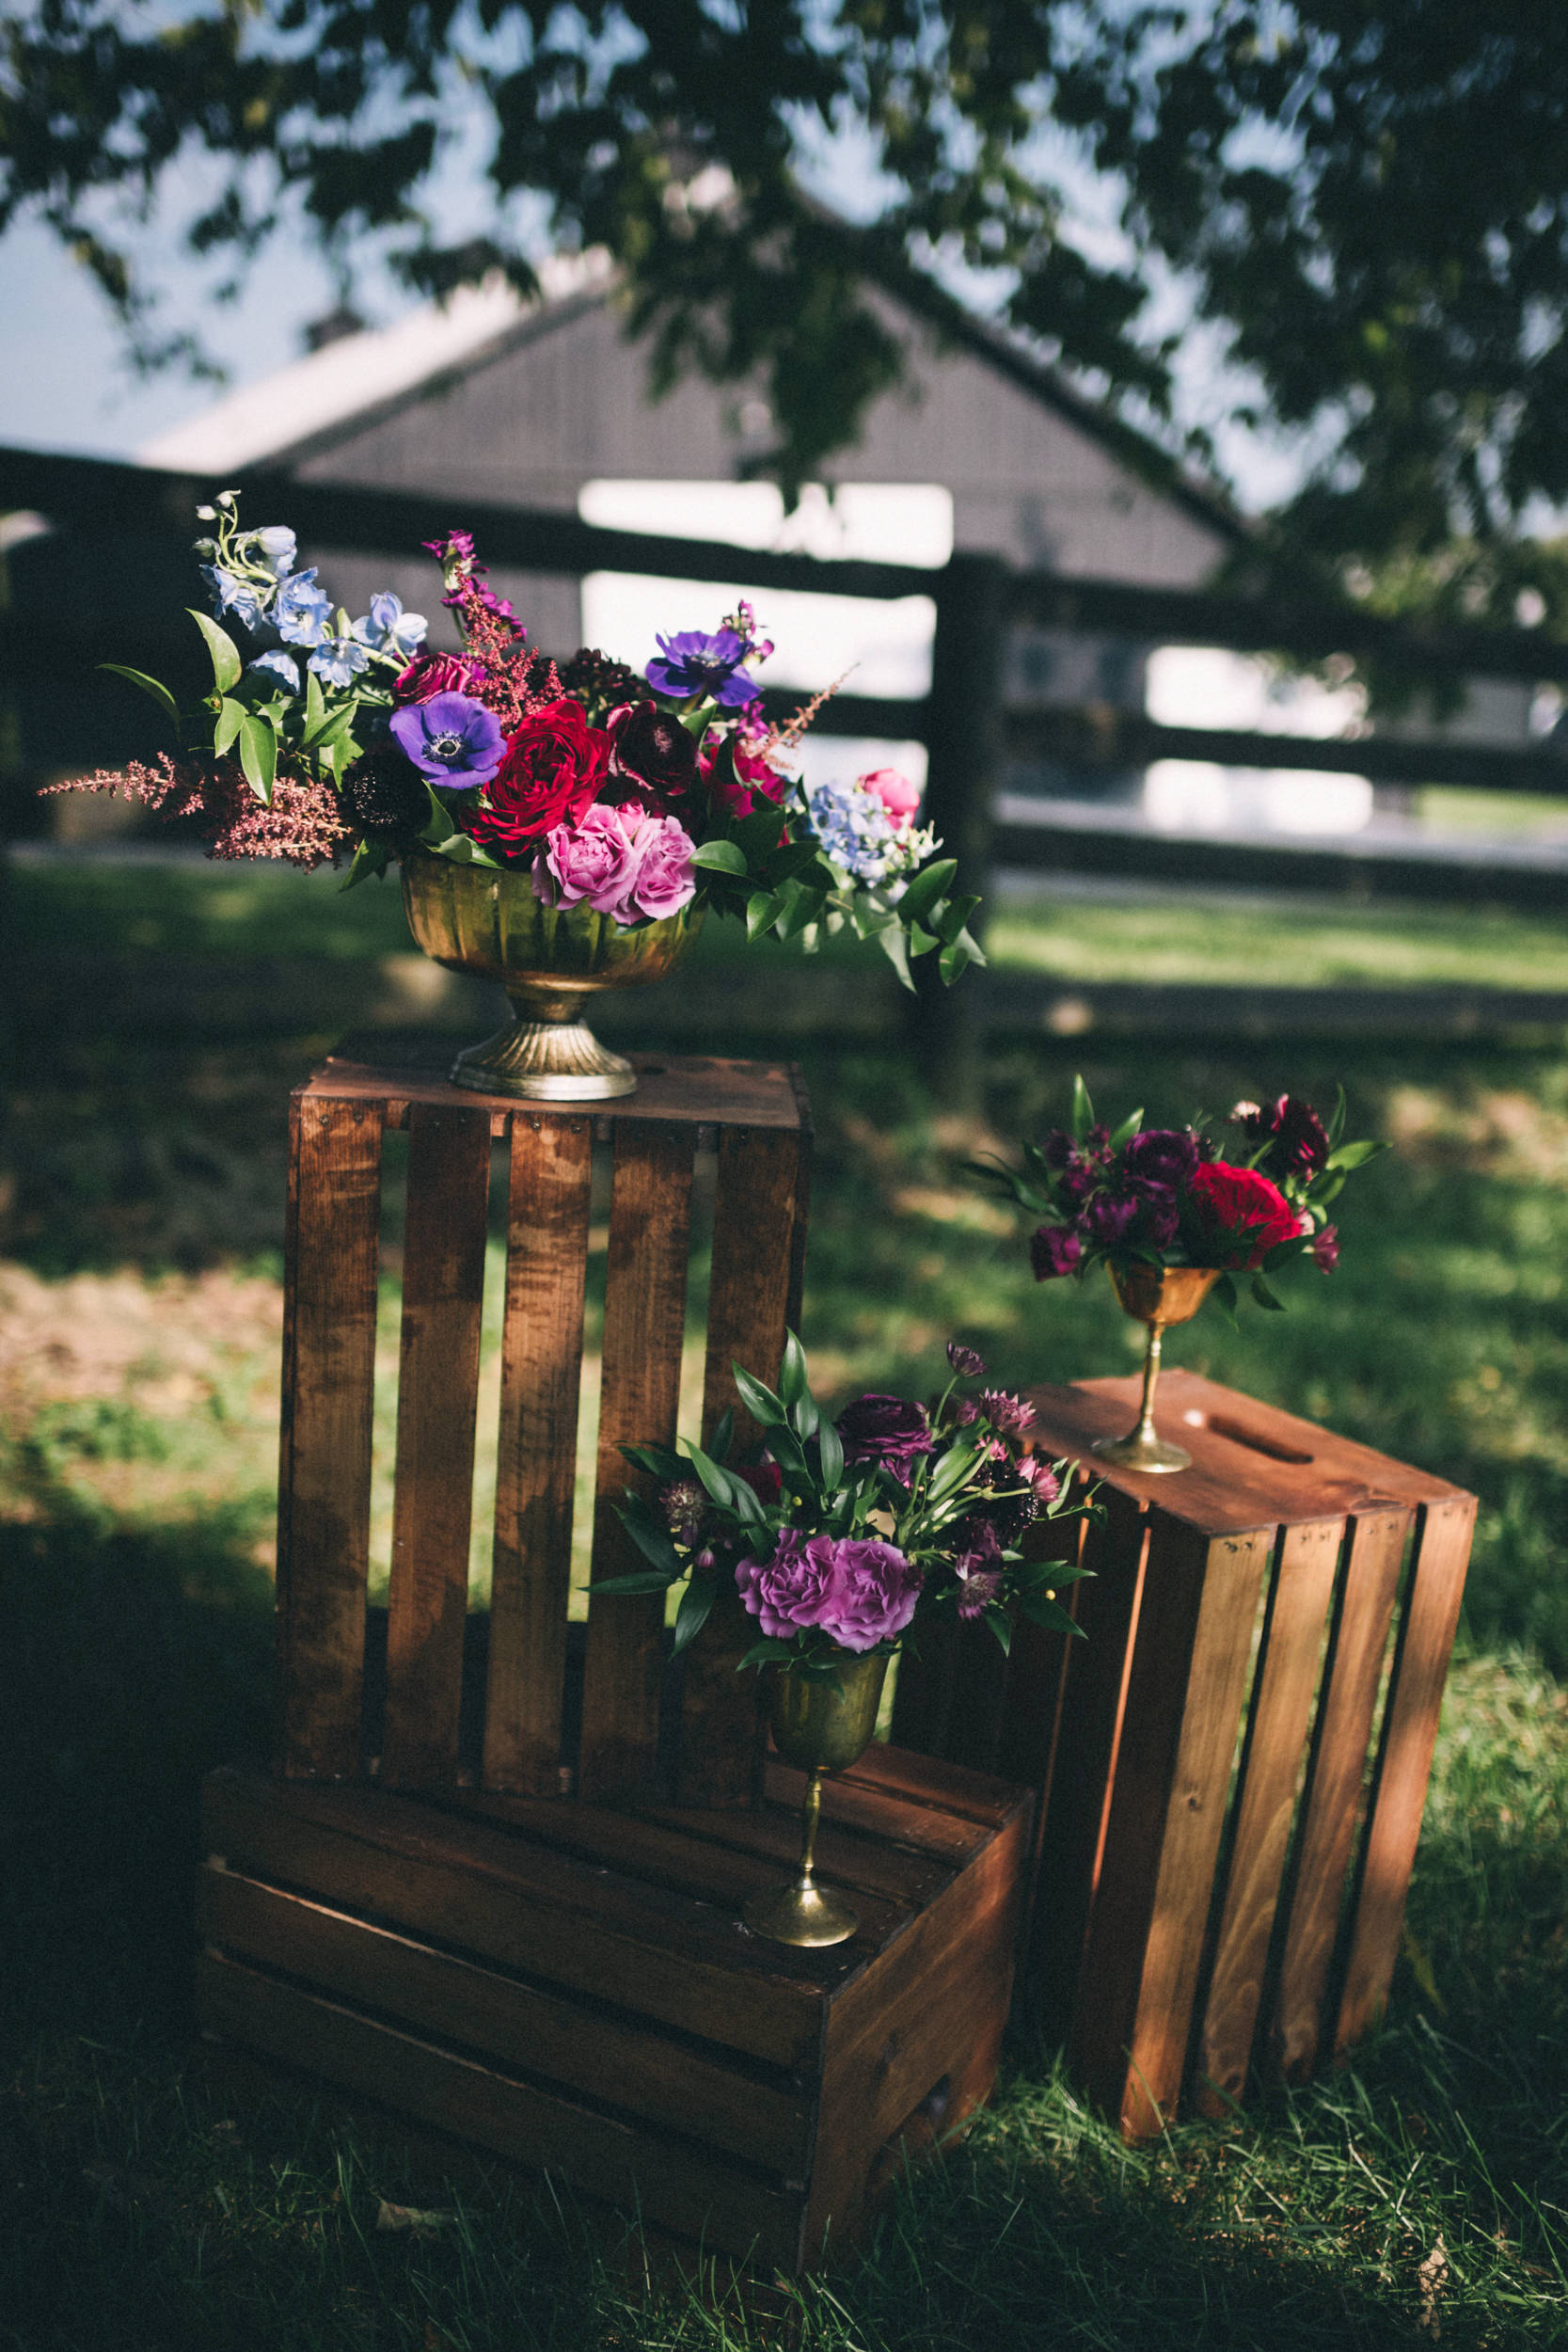 Louisville-Kentucky-Wedding-and-Elopement-Photographer-Sarah-Katherine-Davis-Photography-Summer-Jewel-Toned-Wedding-Chineese-Tea-Ceremony-Warrenwood-Manor-Danville-473.jpg